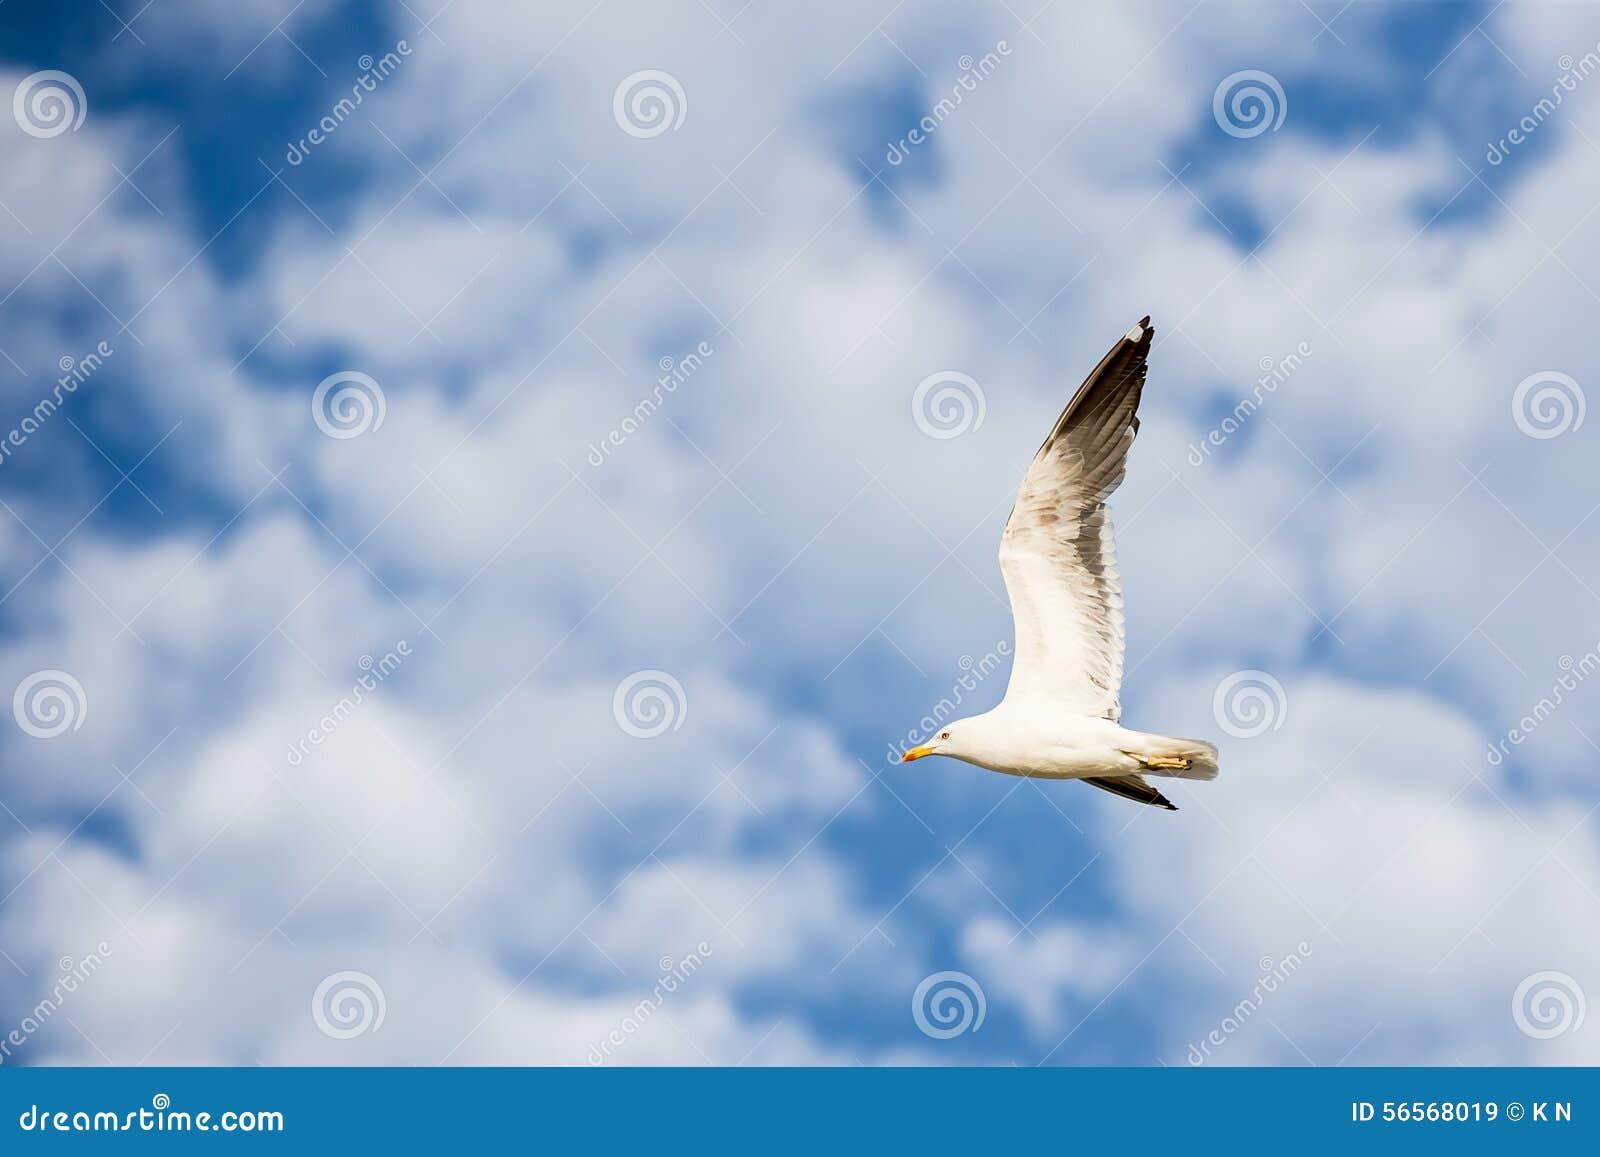 Download Seagull που πετά στο αριστερό σε έναν μπλε ουρανό με τα άσπρα σύννεφα Στοκ Εικόνα - εικόνα από κοίταγμα, μύγα: 56568019